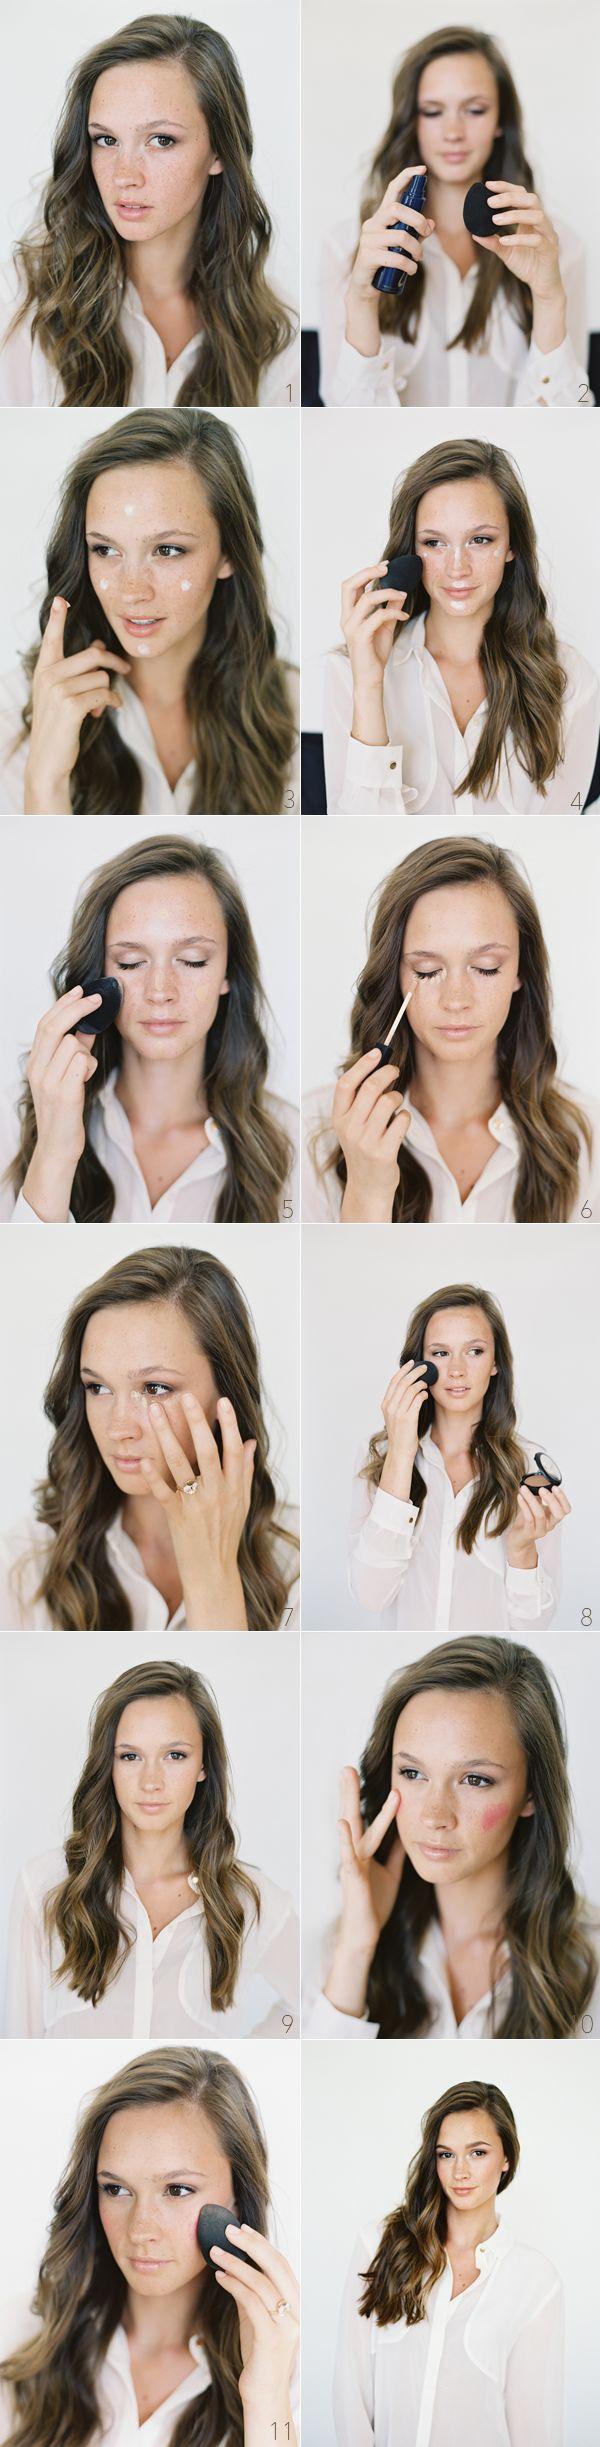 Flawless Skin Beauty Tutorial - #beauty #diyweddings #makeup